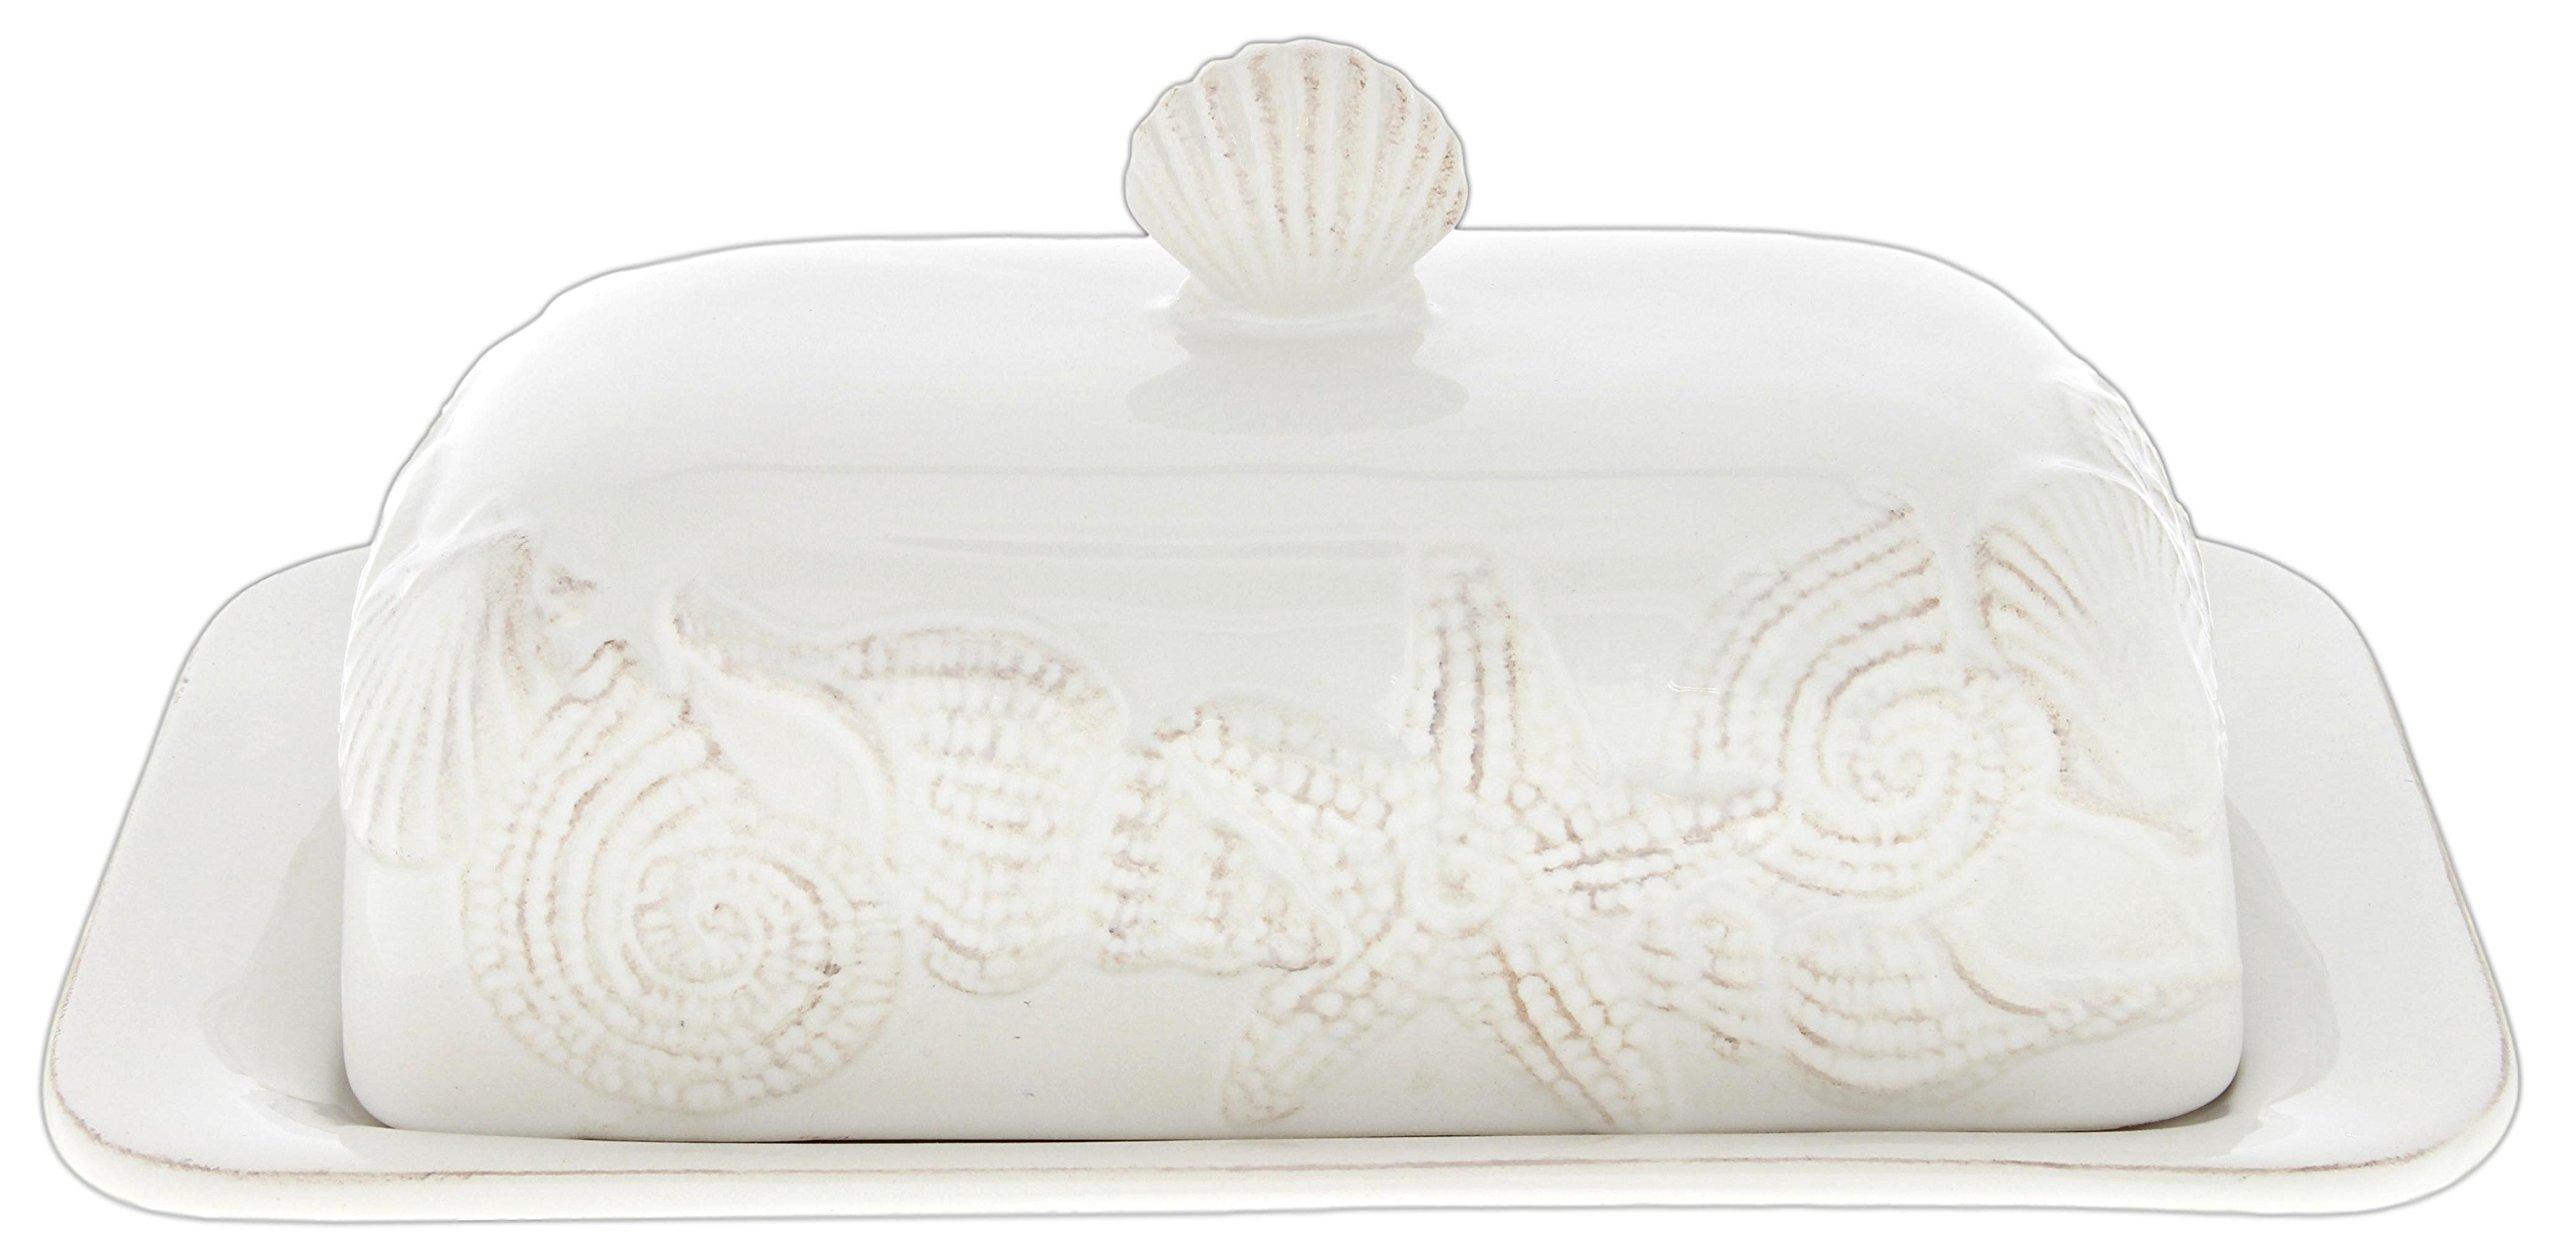 Blue Sky White Ceramic Sea Shells Butter Dish